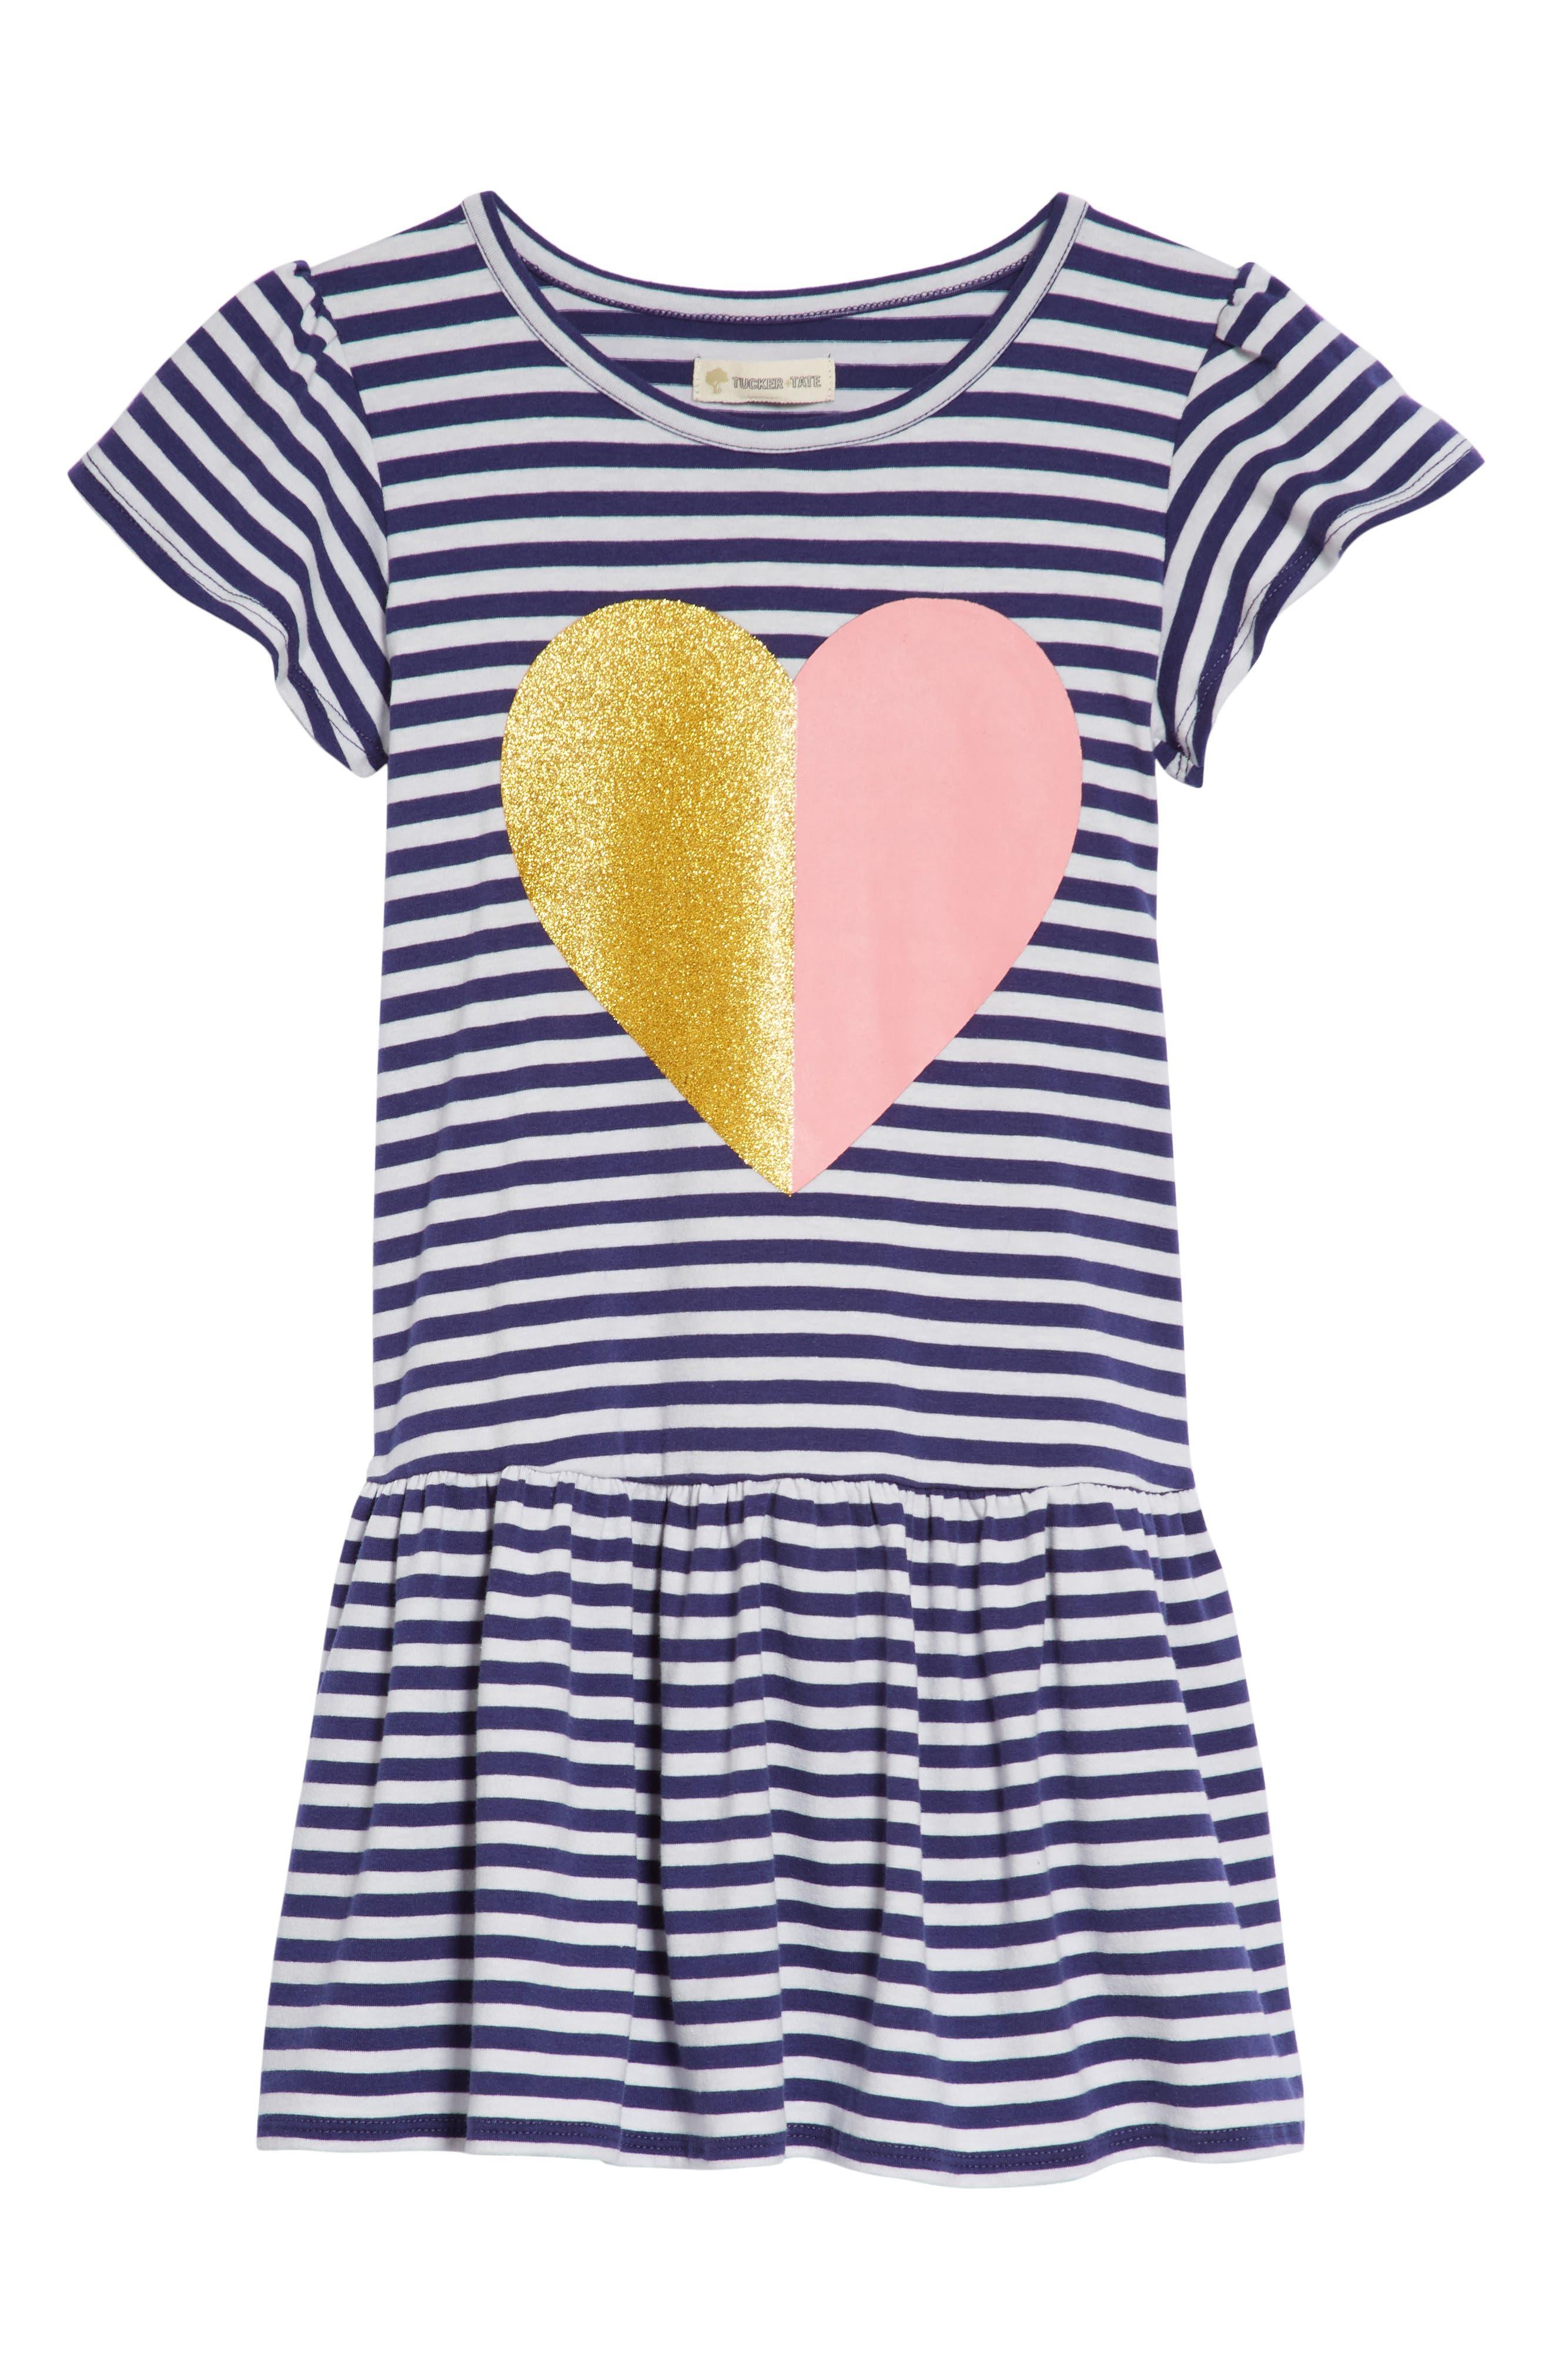 Graphic Stripe Dress,                             Main thumbnail 1, color,                             Navy Ribbon Sparkle Heart